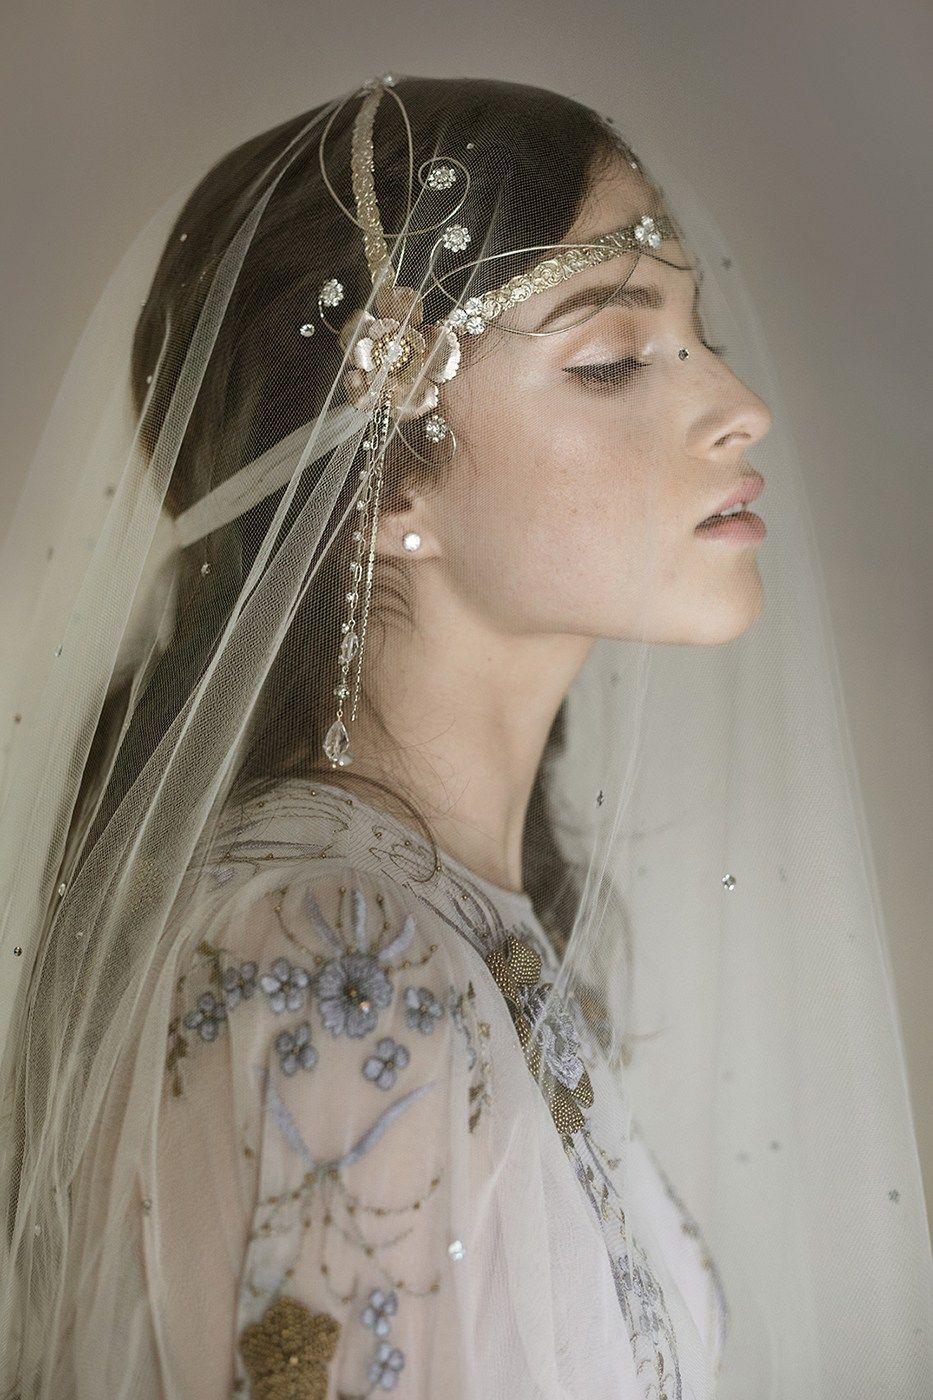 Erica Elizabeth Designs Pure Poetry wedding headdress. A